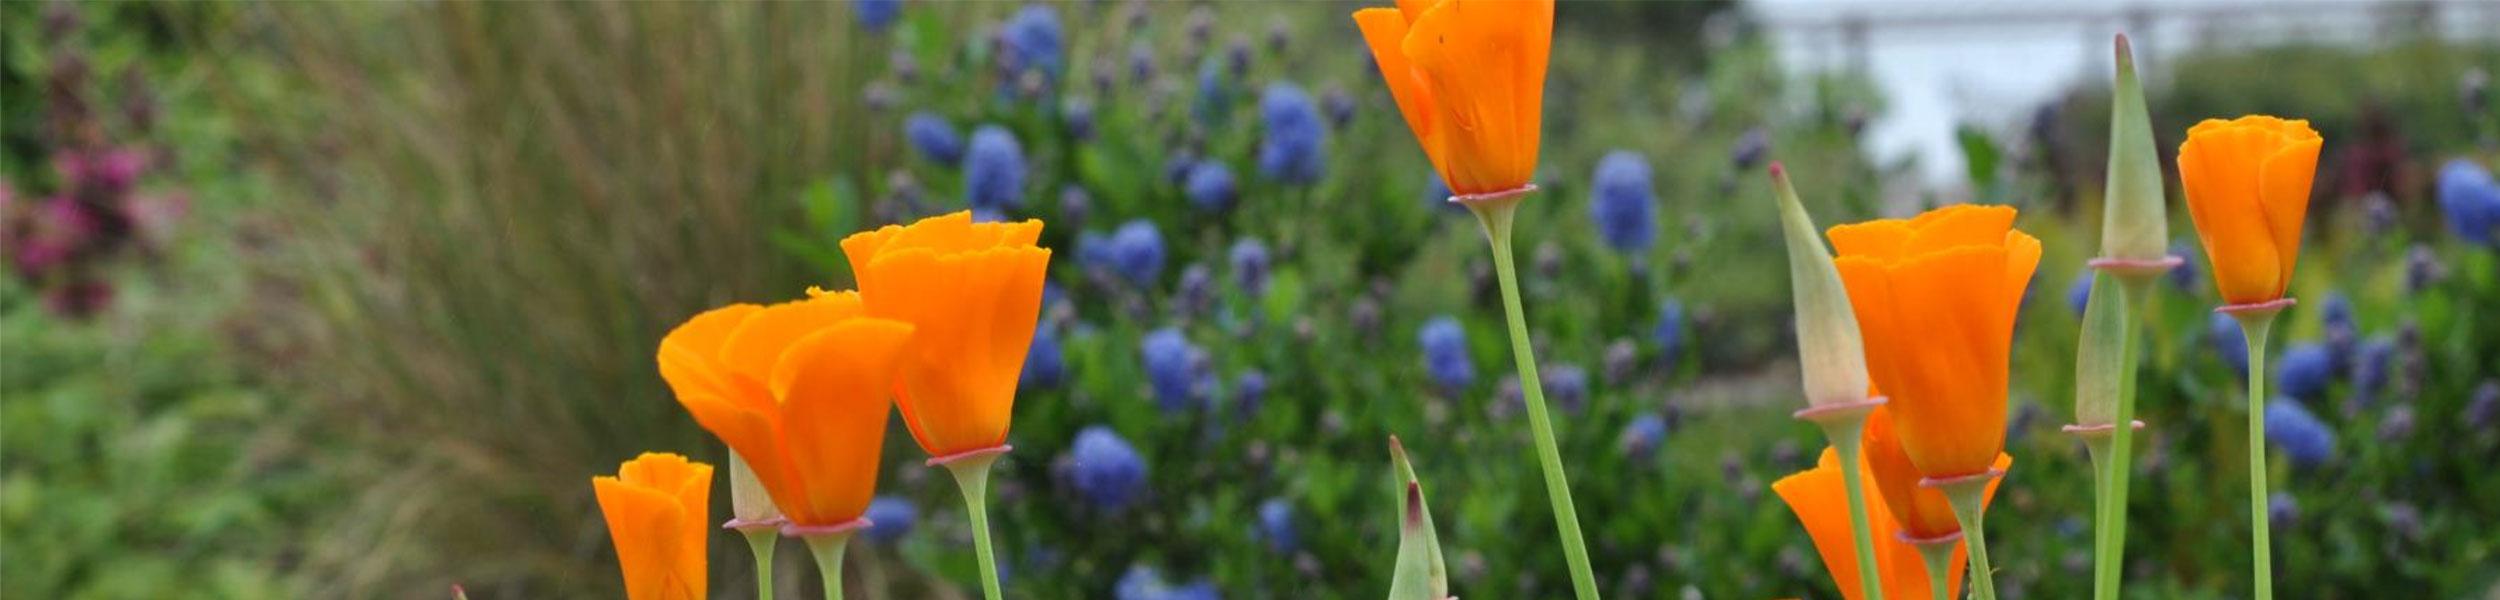 Humboldt Botanical Garden Summer Music Series- Lyndsey Battle